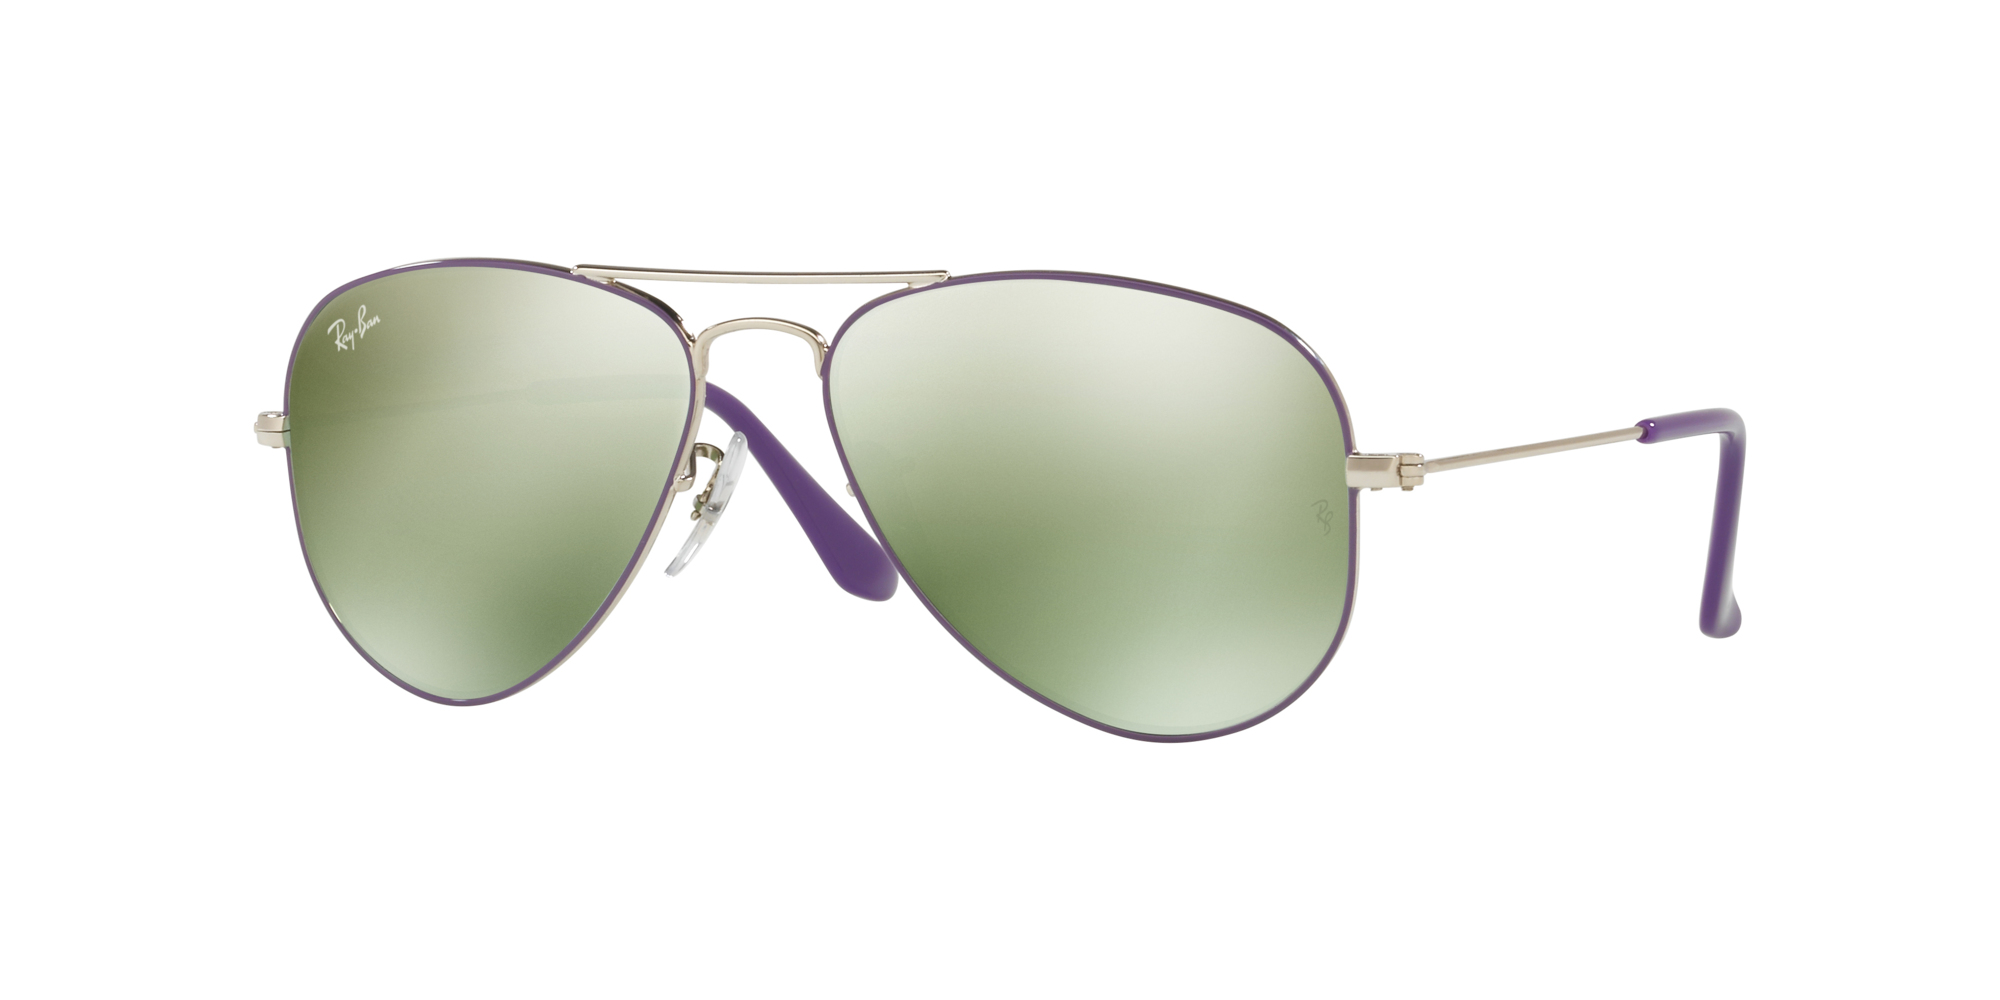 da7dfd96758 Eyewear for Kids - Purple - Optiwow